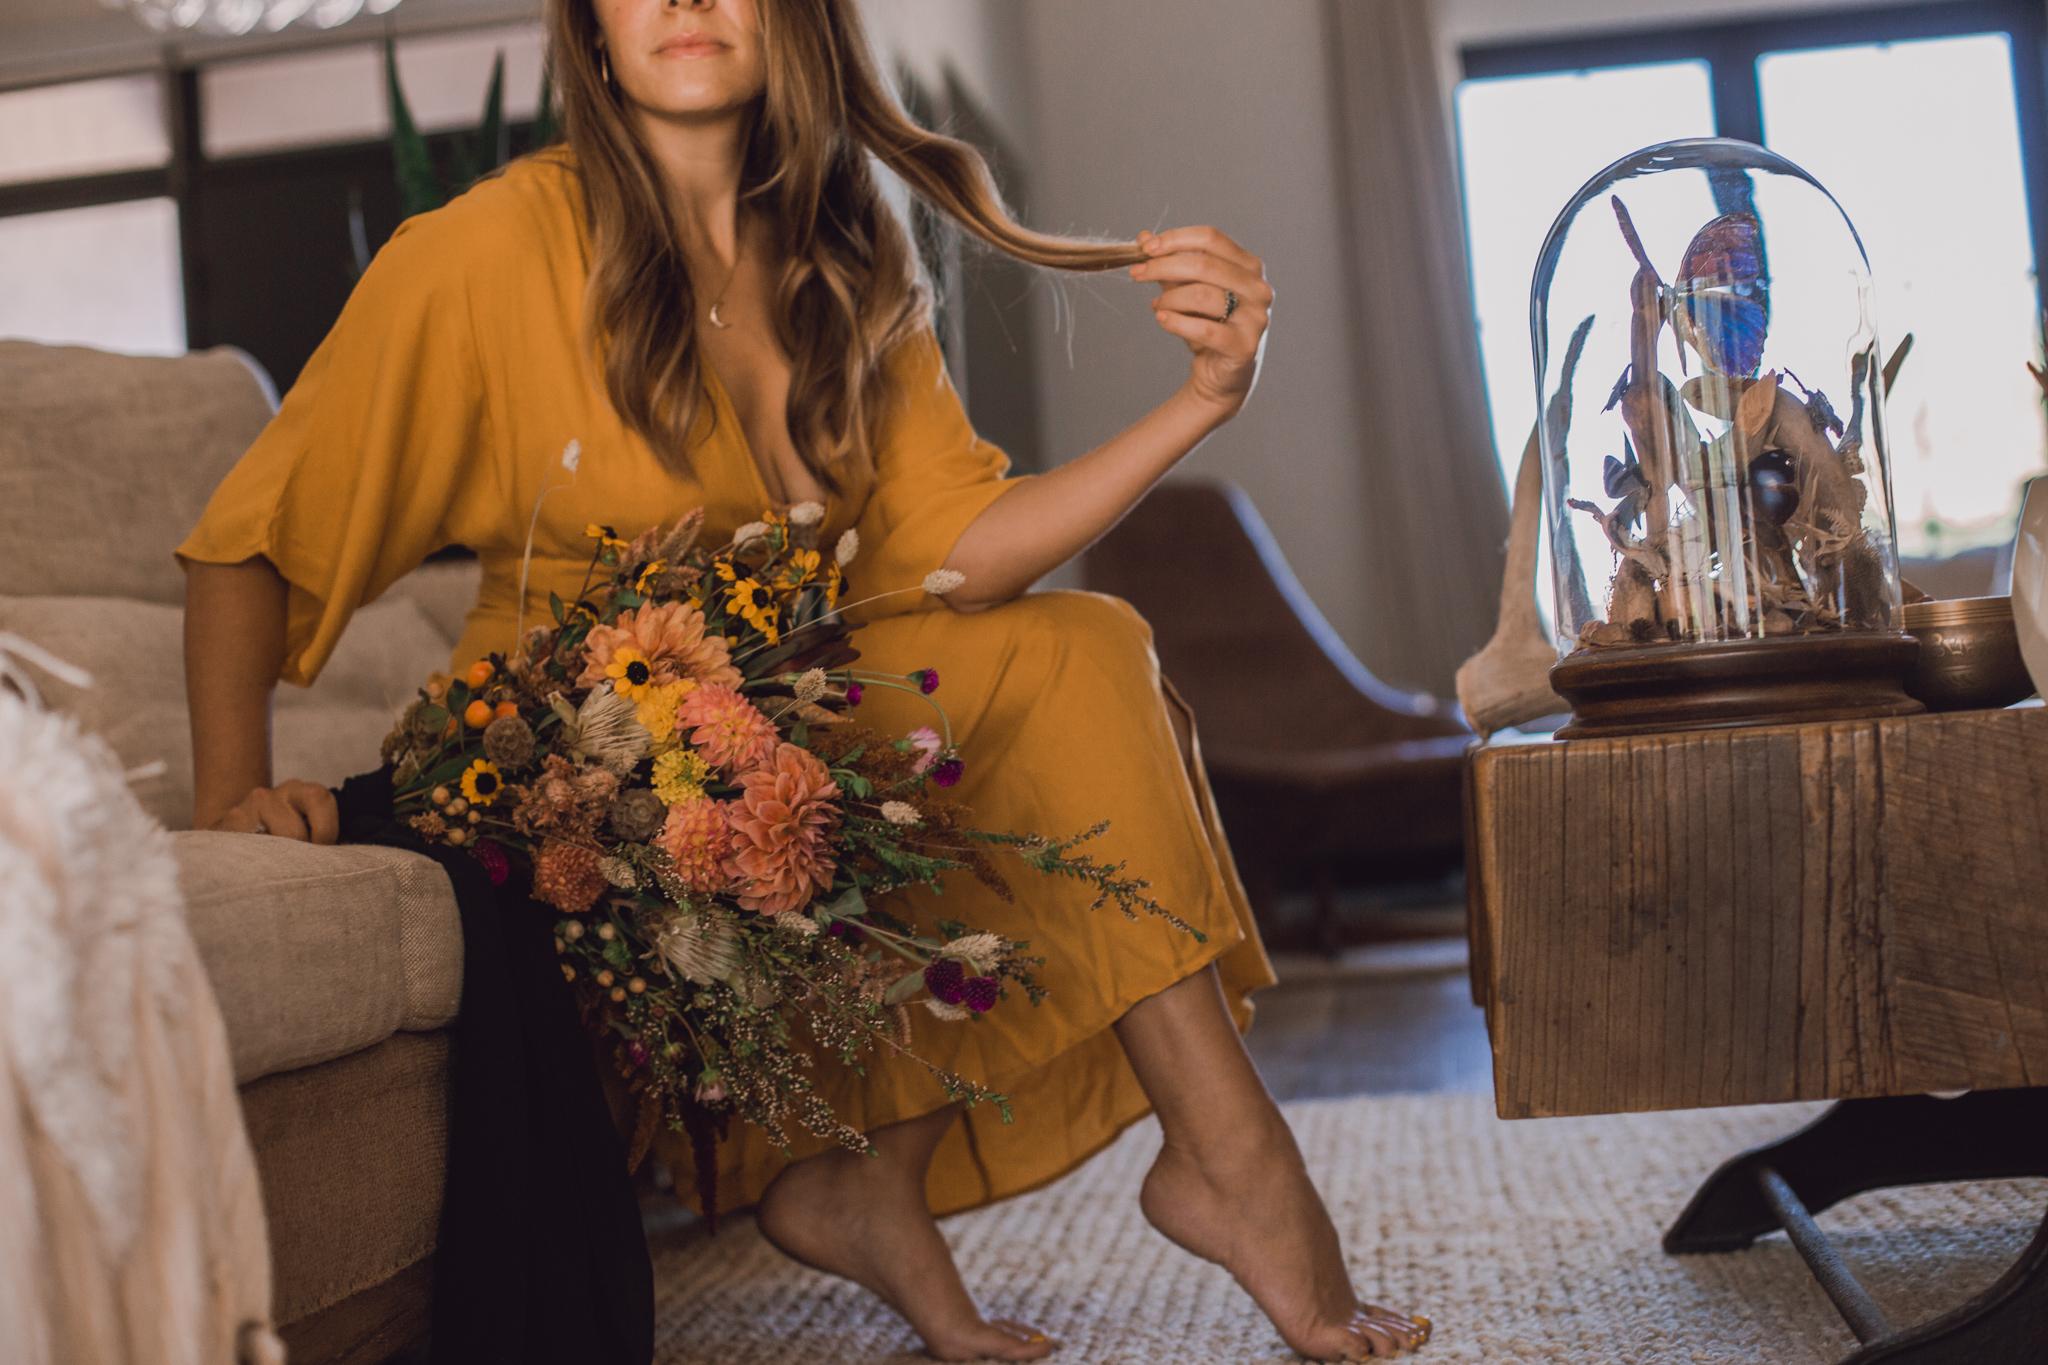 forever-21-yellow-dress-dark-moody-photography